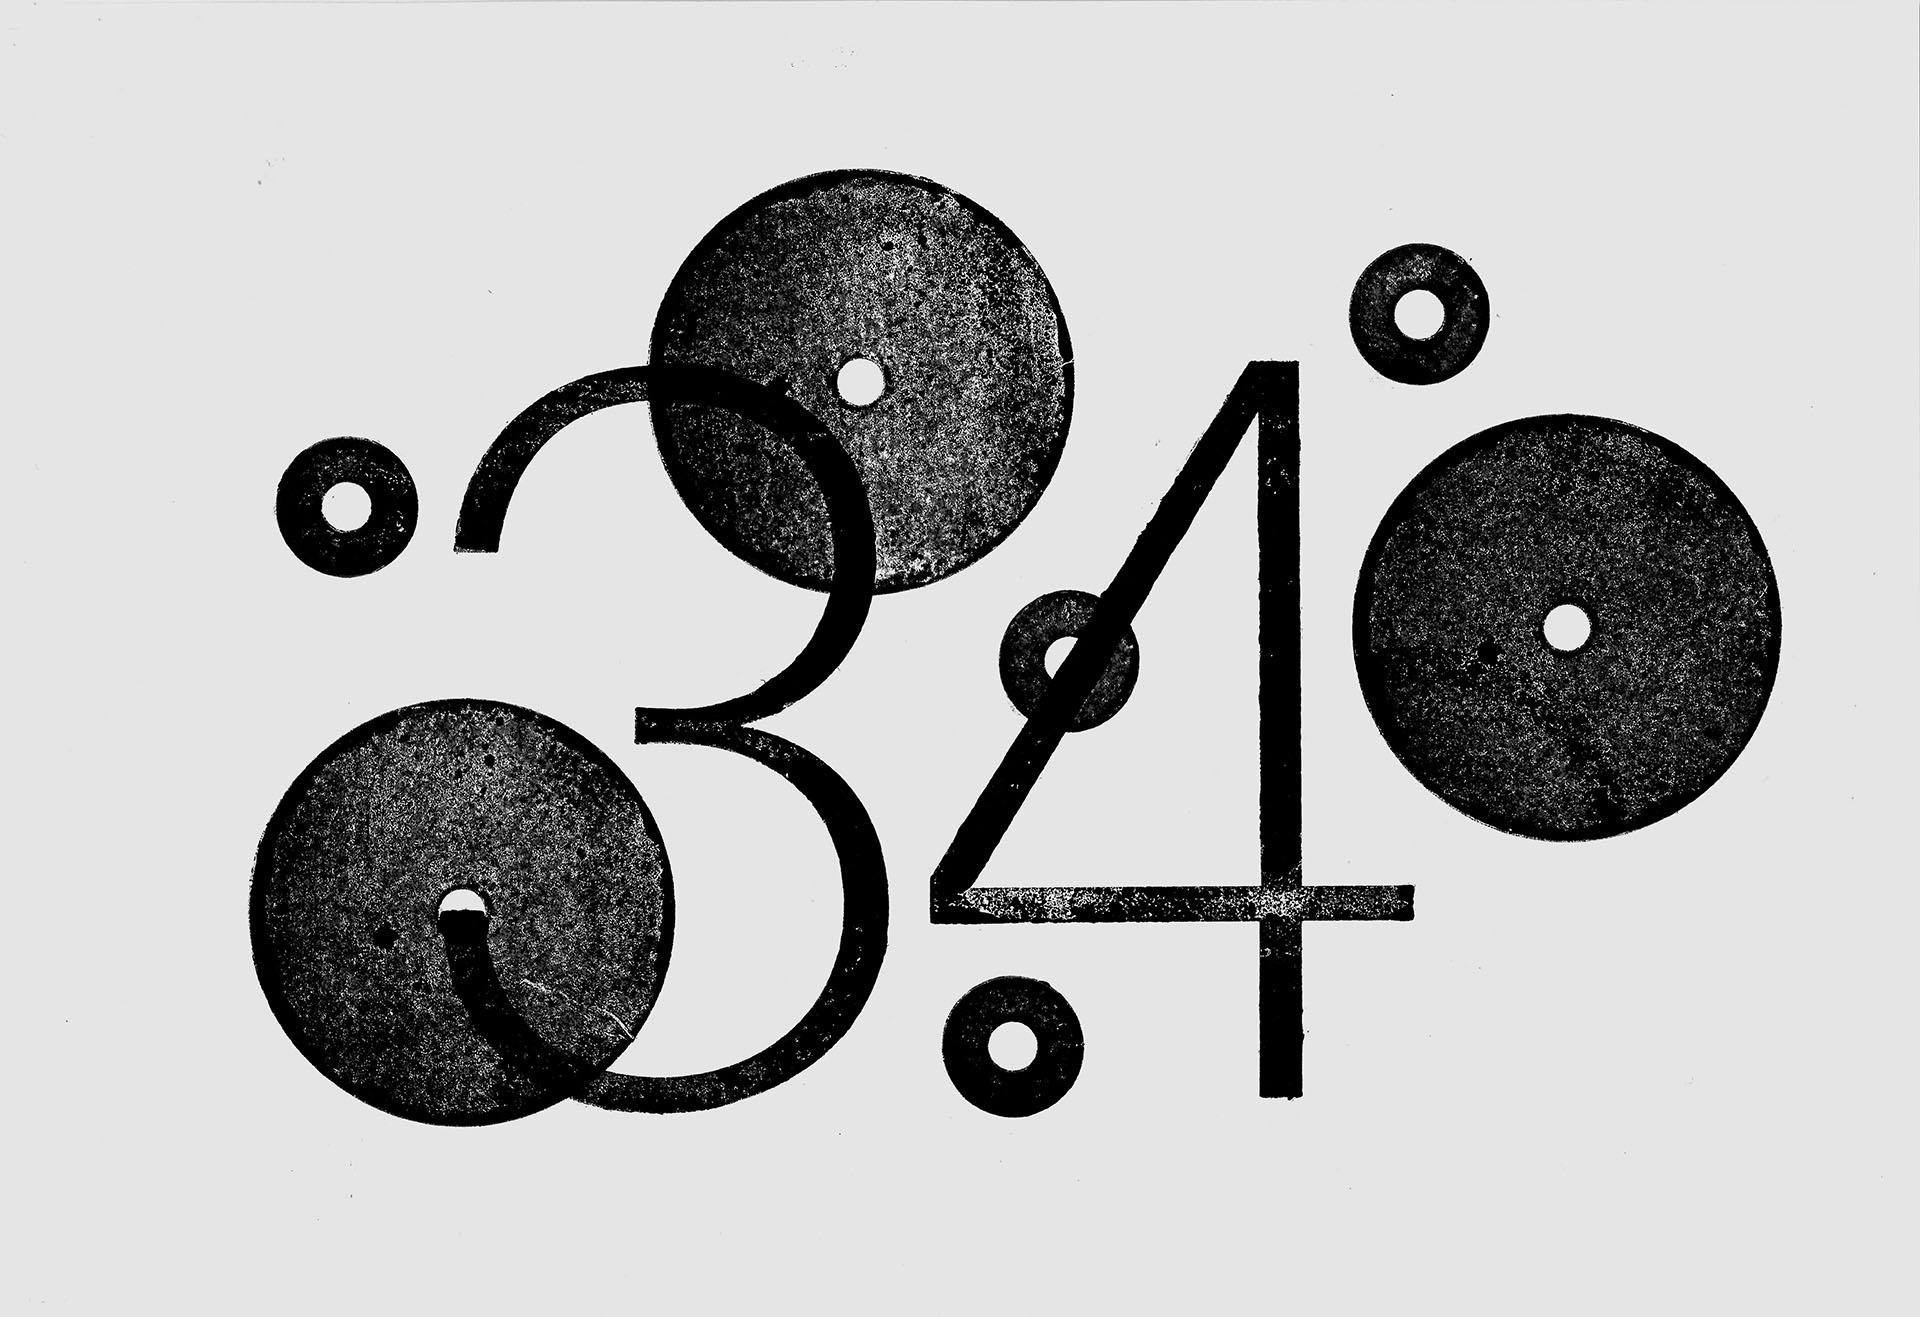 Yun Yu_34 circles